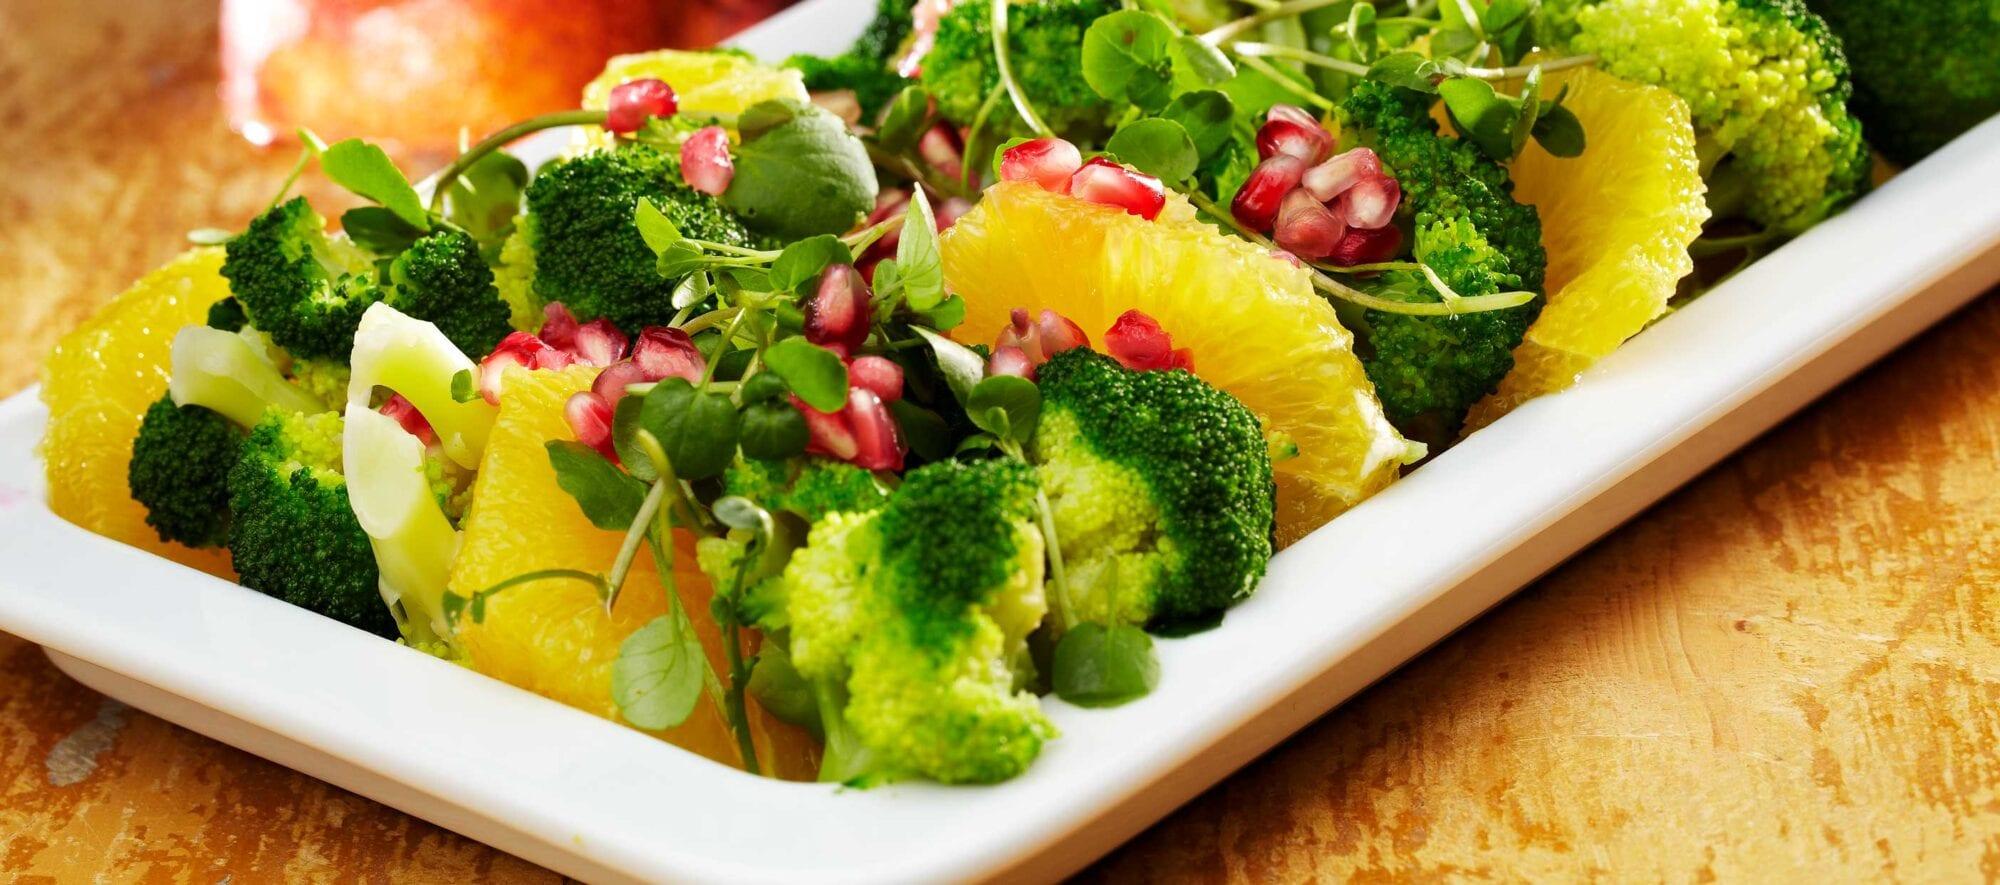 Broccolisalat citrusilik